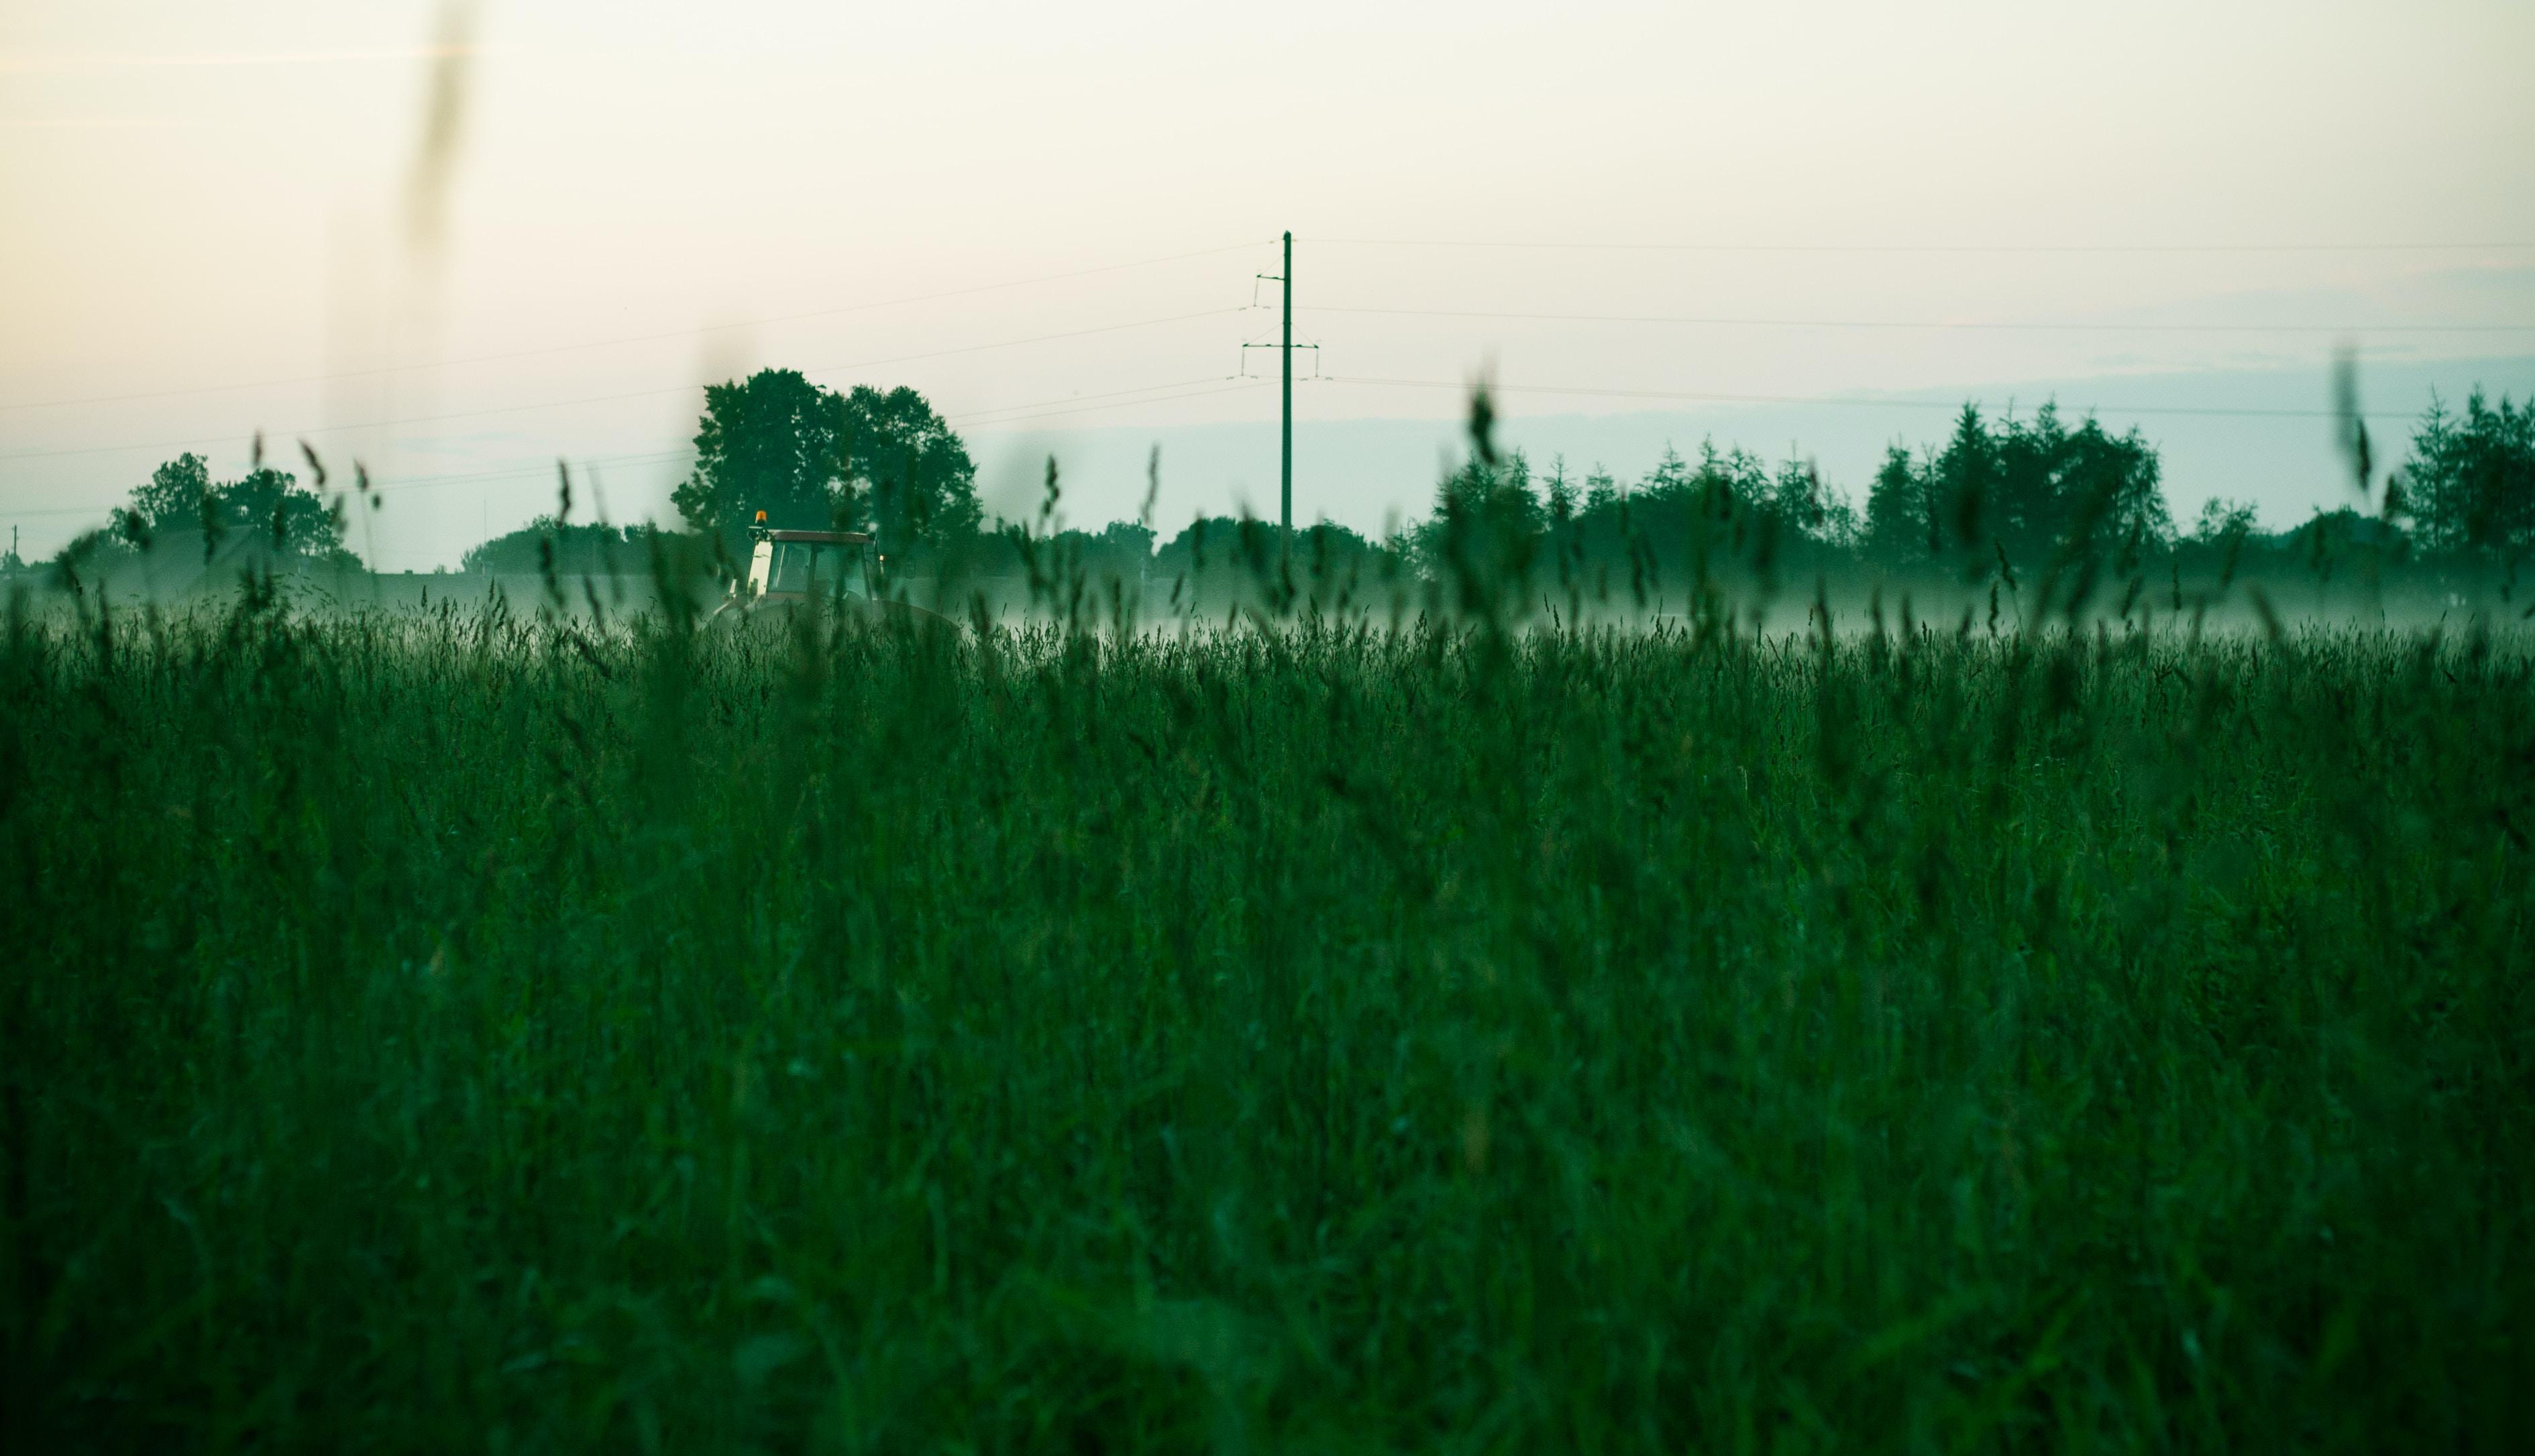 Free Unsplash photo from Maria  Pranka